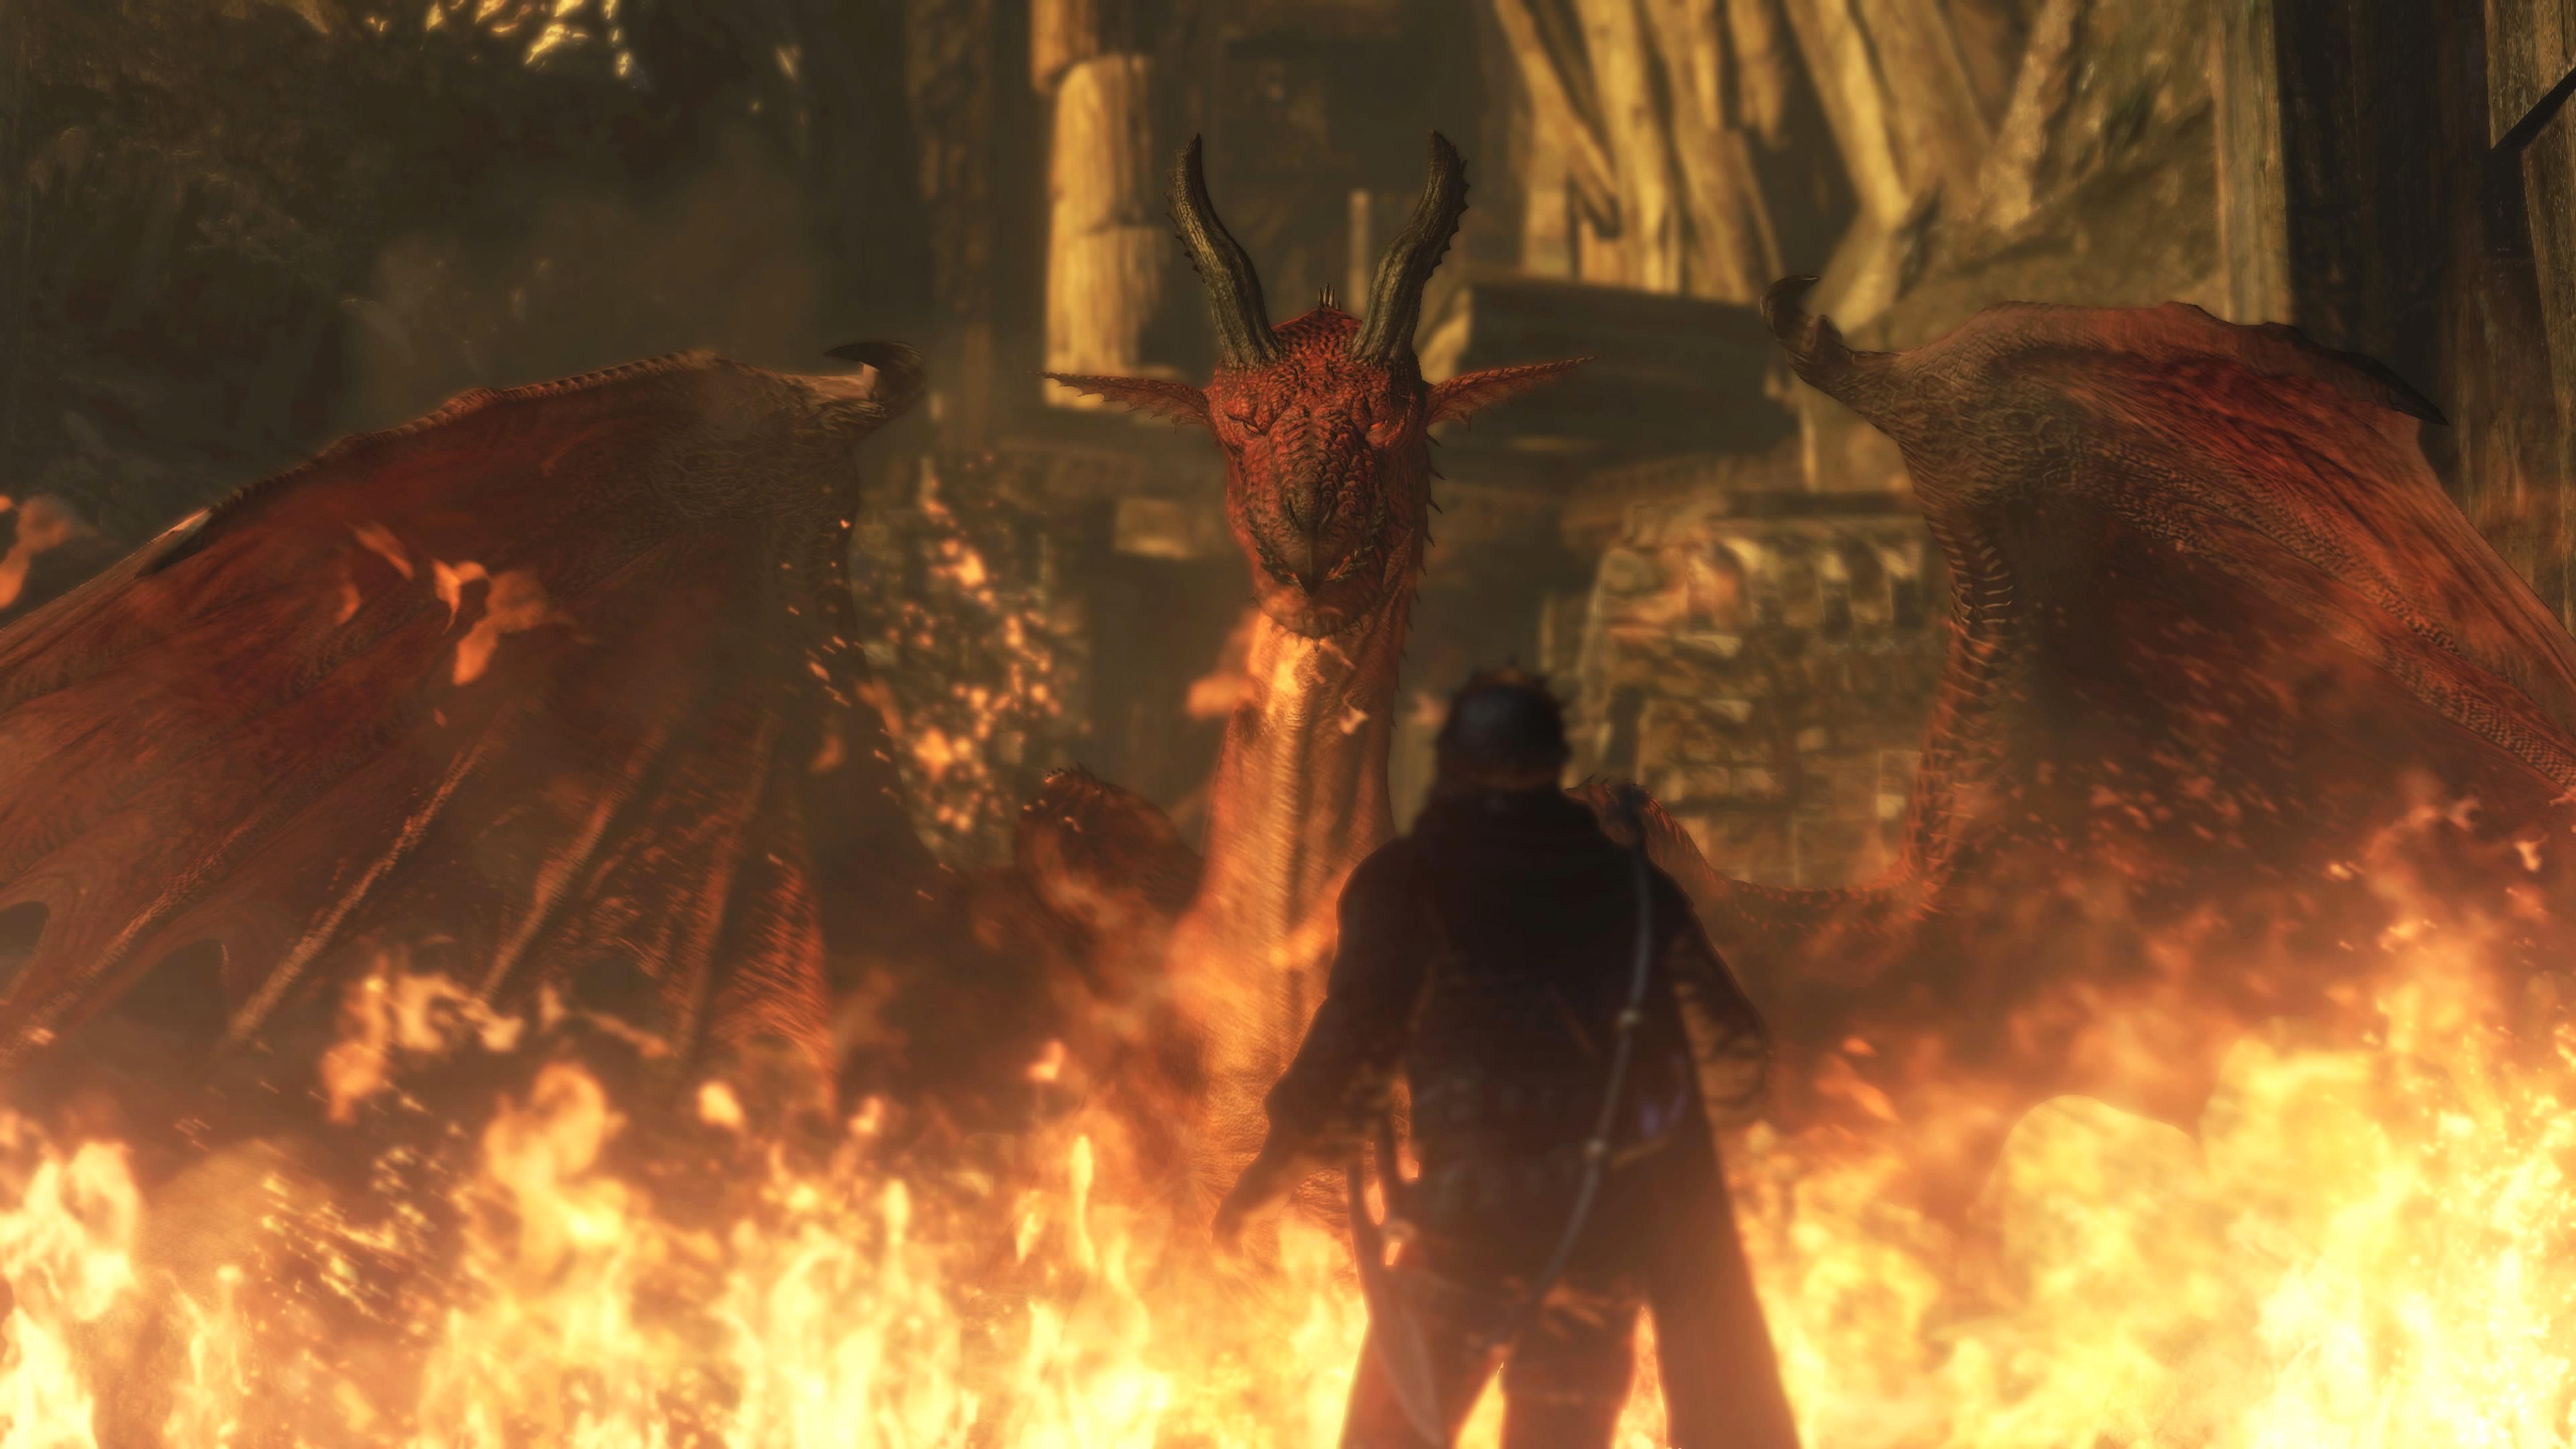 3. října vyjde Dragon's Dogma: Dark Arisen pro PS4 a Xbox One 148238